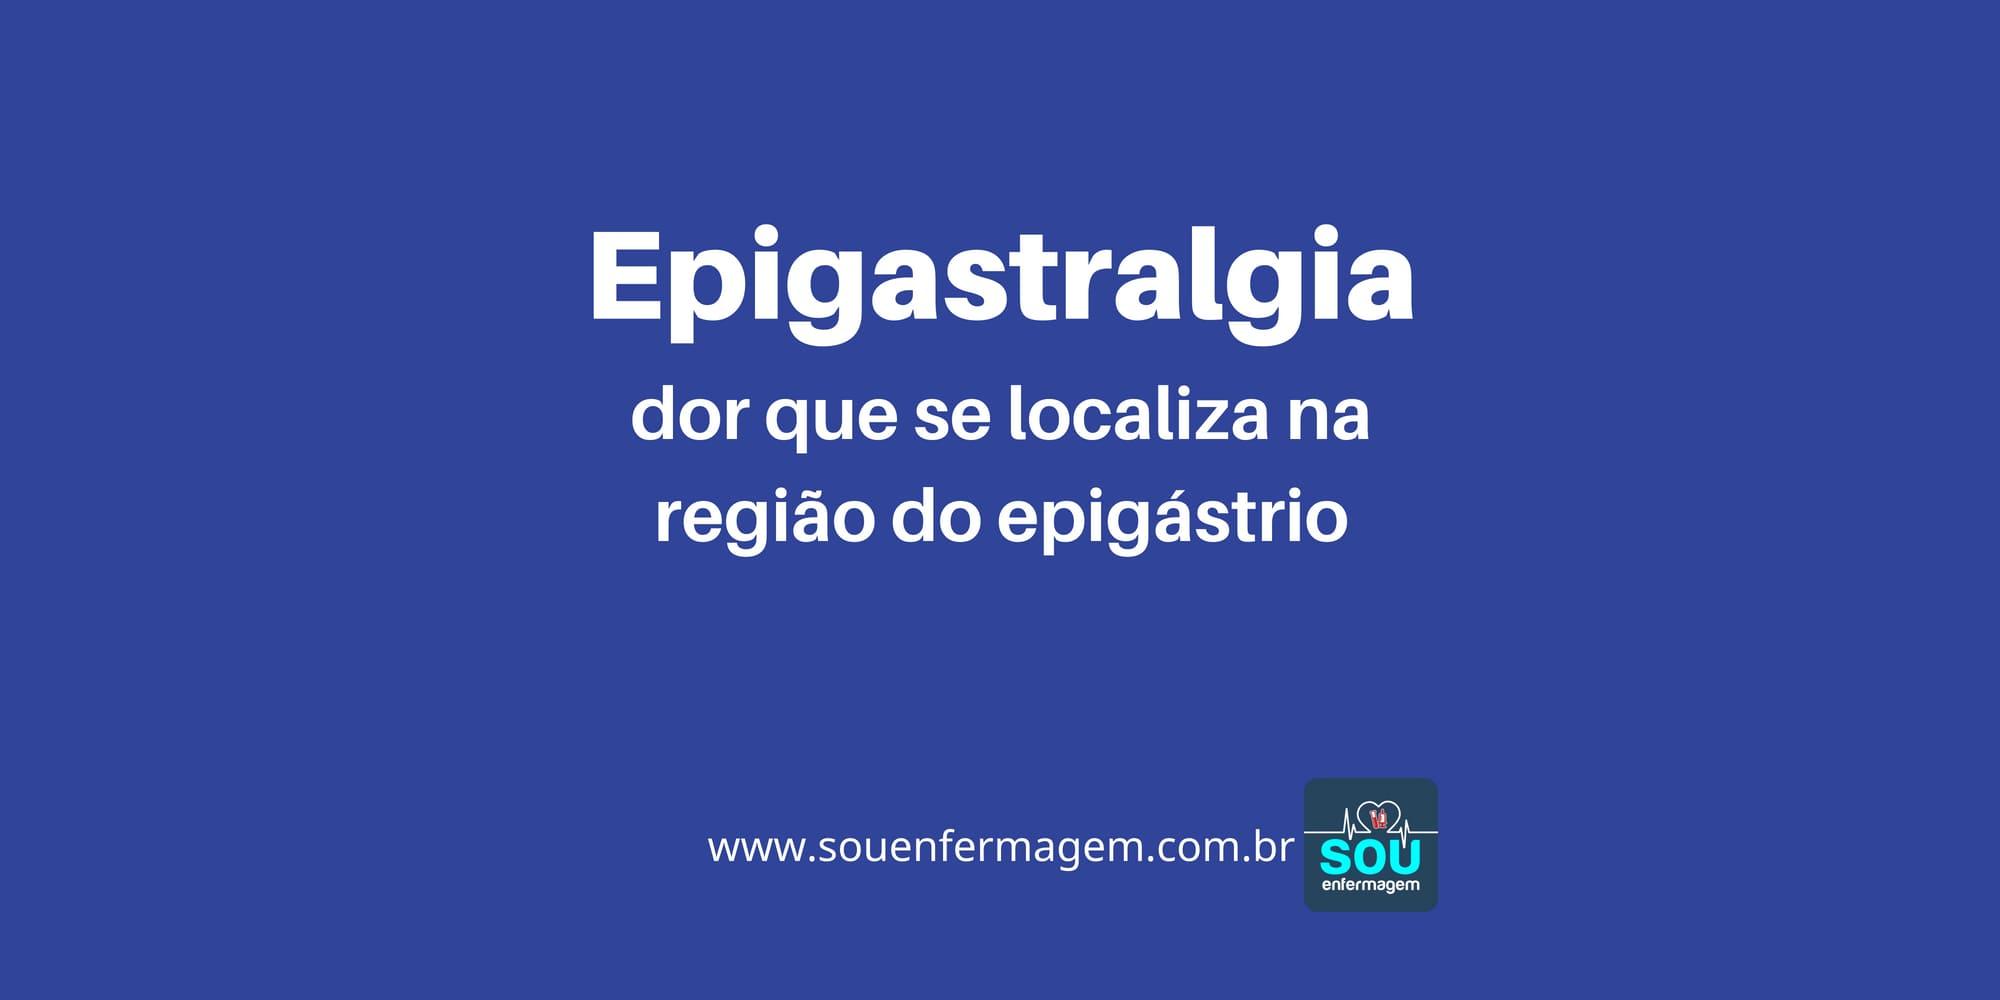 Epigastralgia